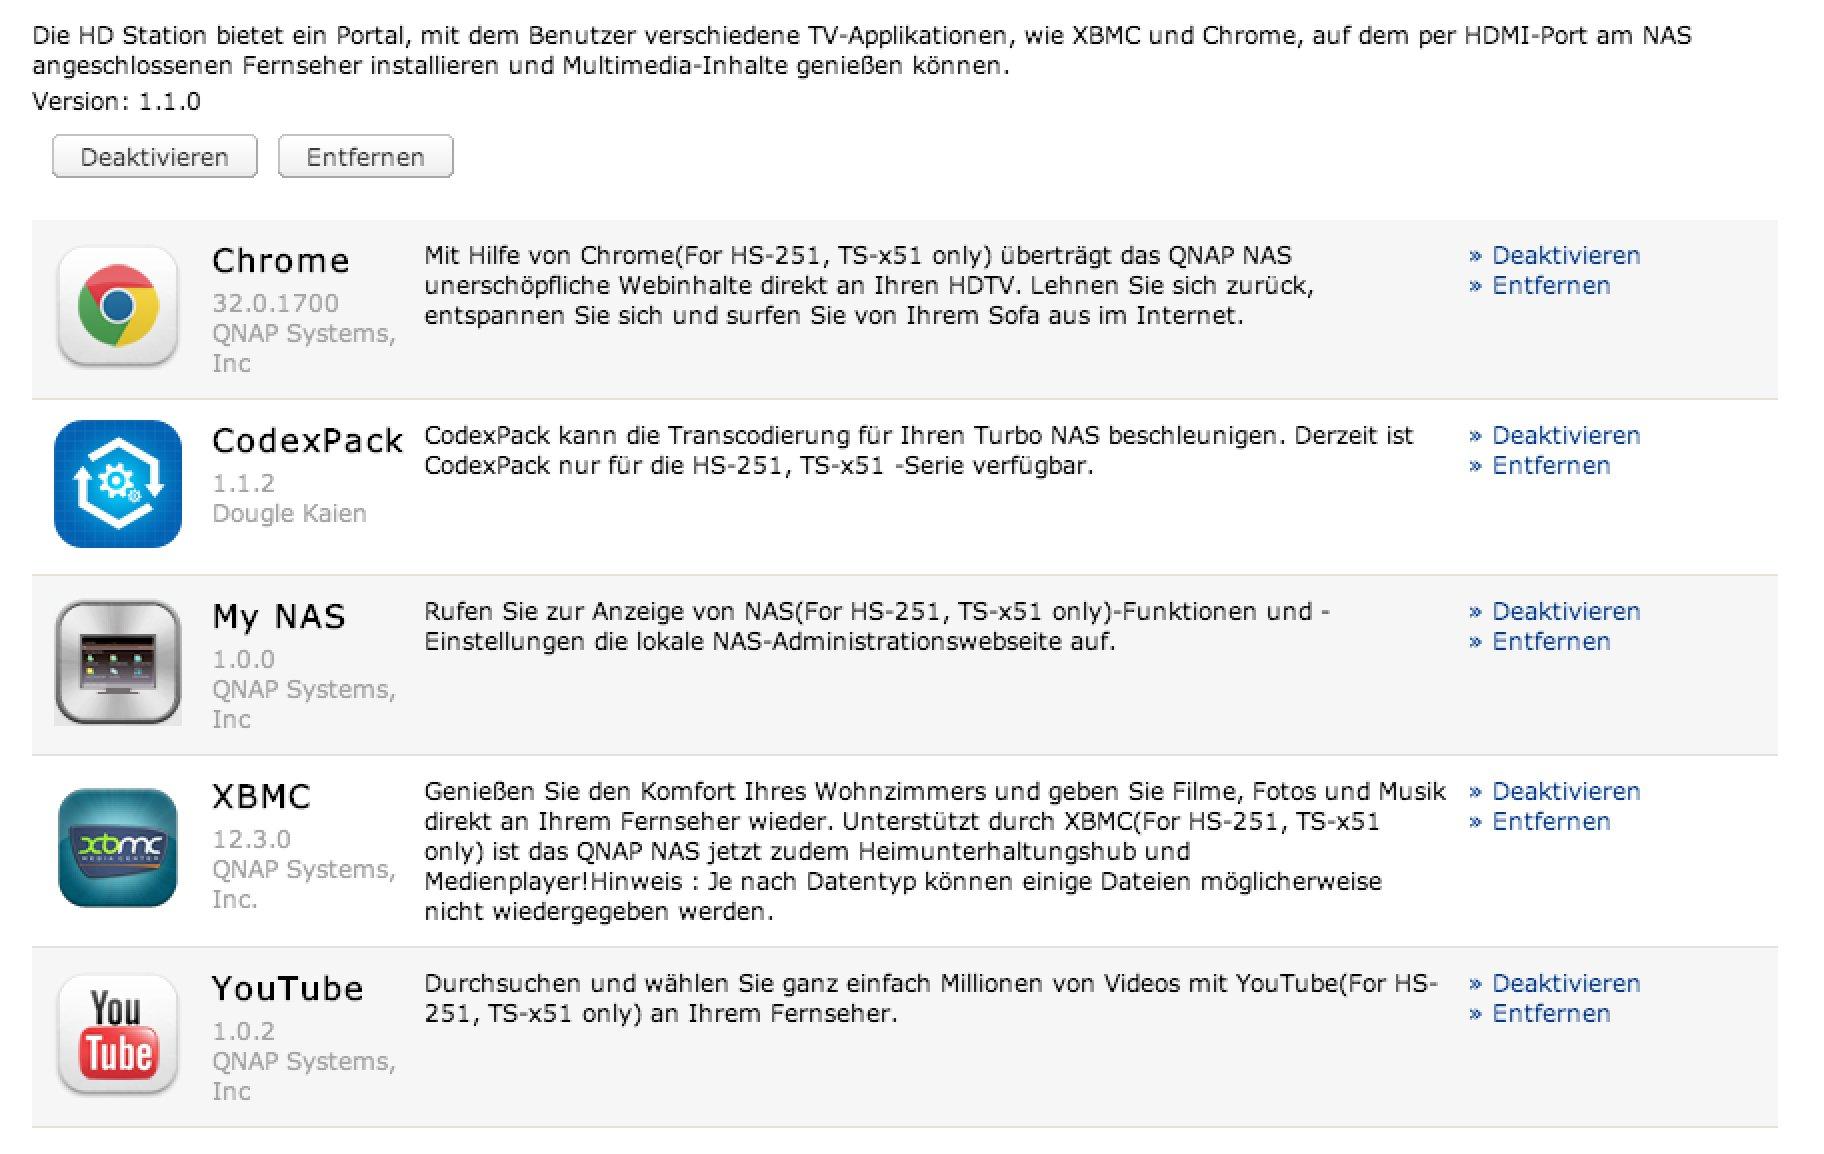 QNAP HS-251 Test - lautloses Profi-NAS mit HDMI, Plex und XBMC!